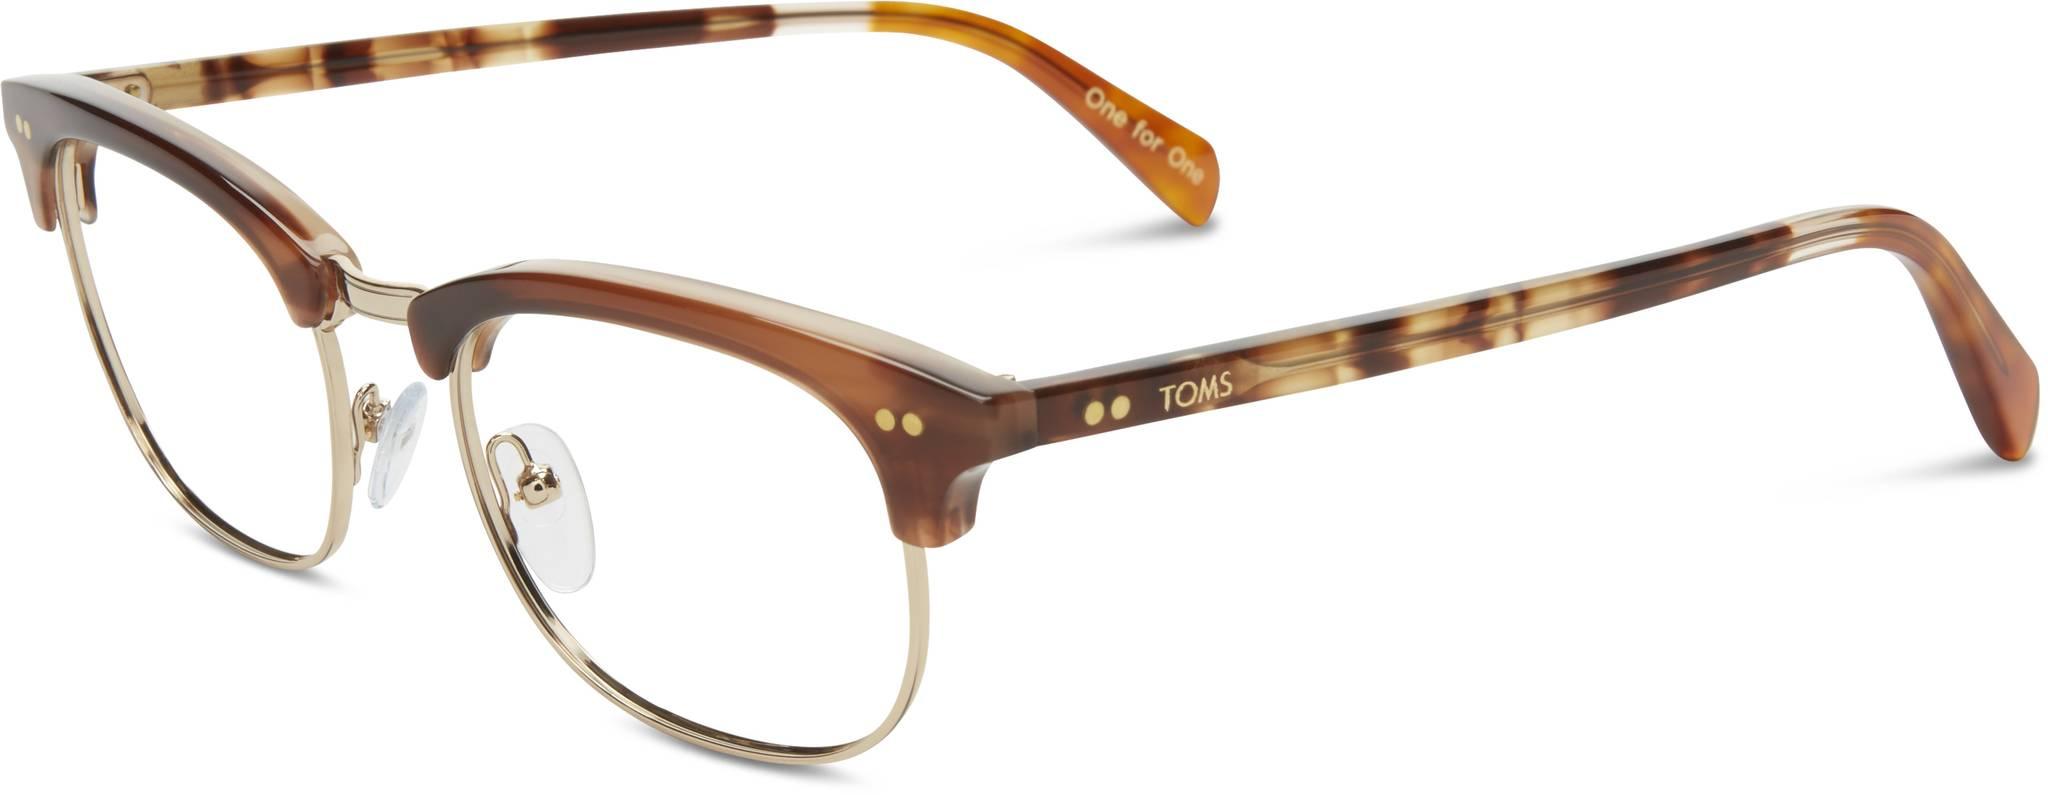 Milton by TOMS Eyeglasses